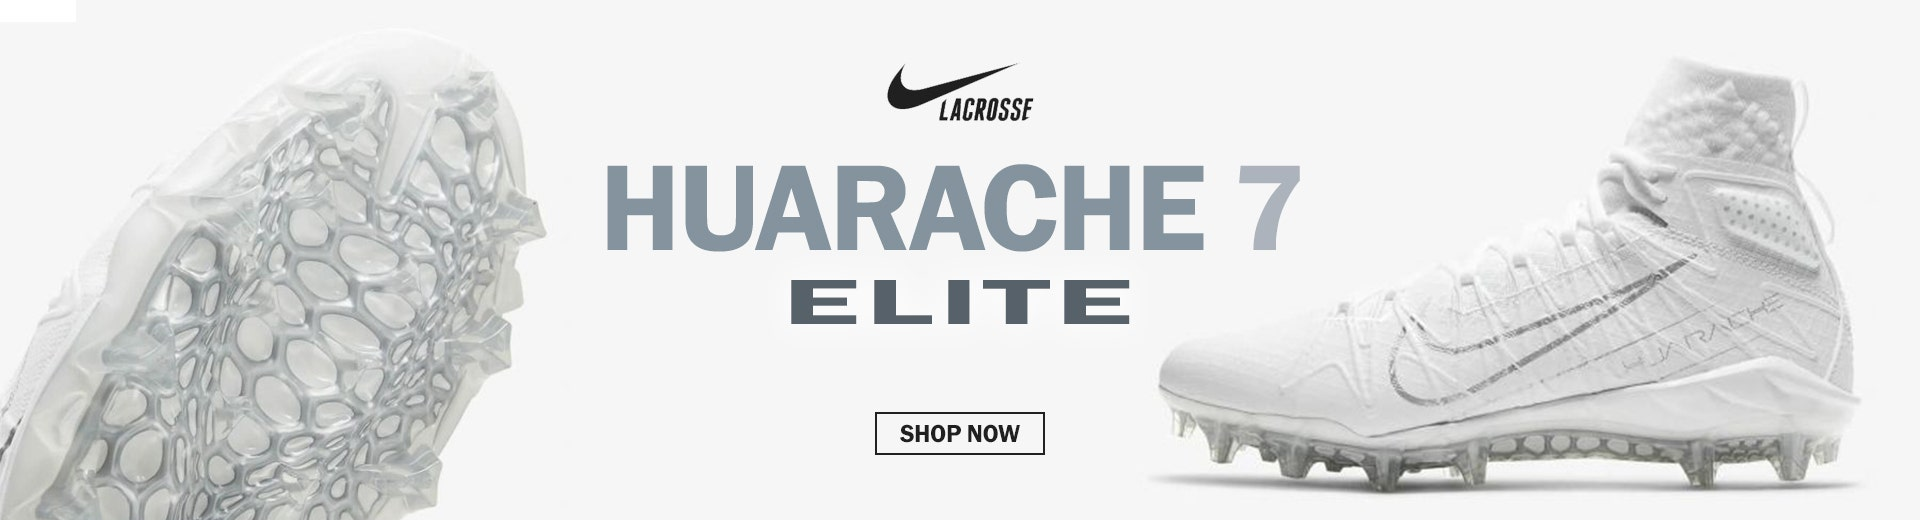 Nike Alpha Huarache 7 Cleats - DESKTOP